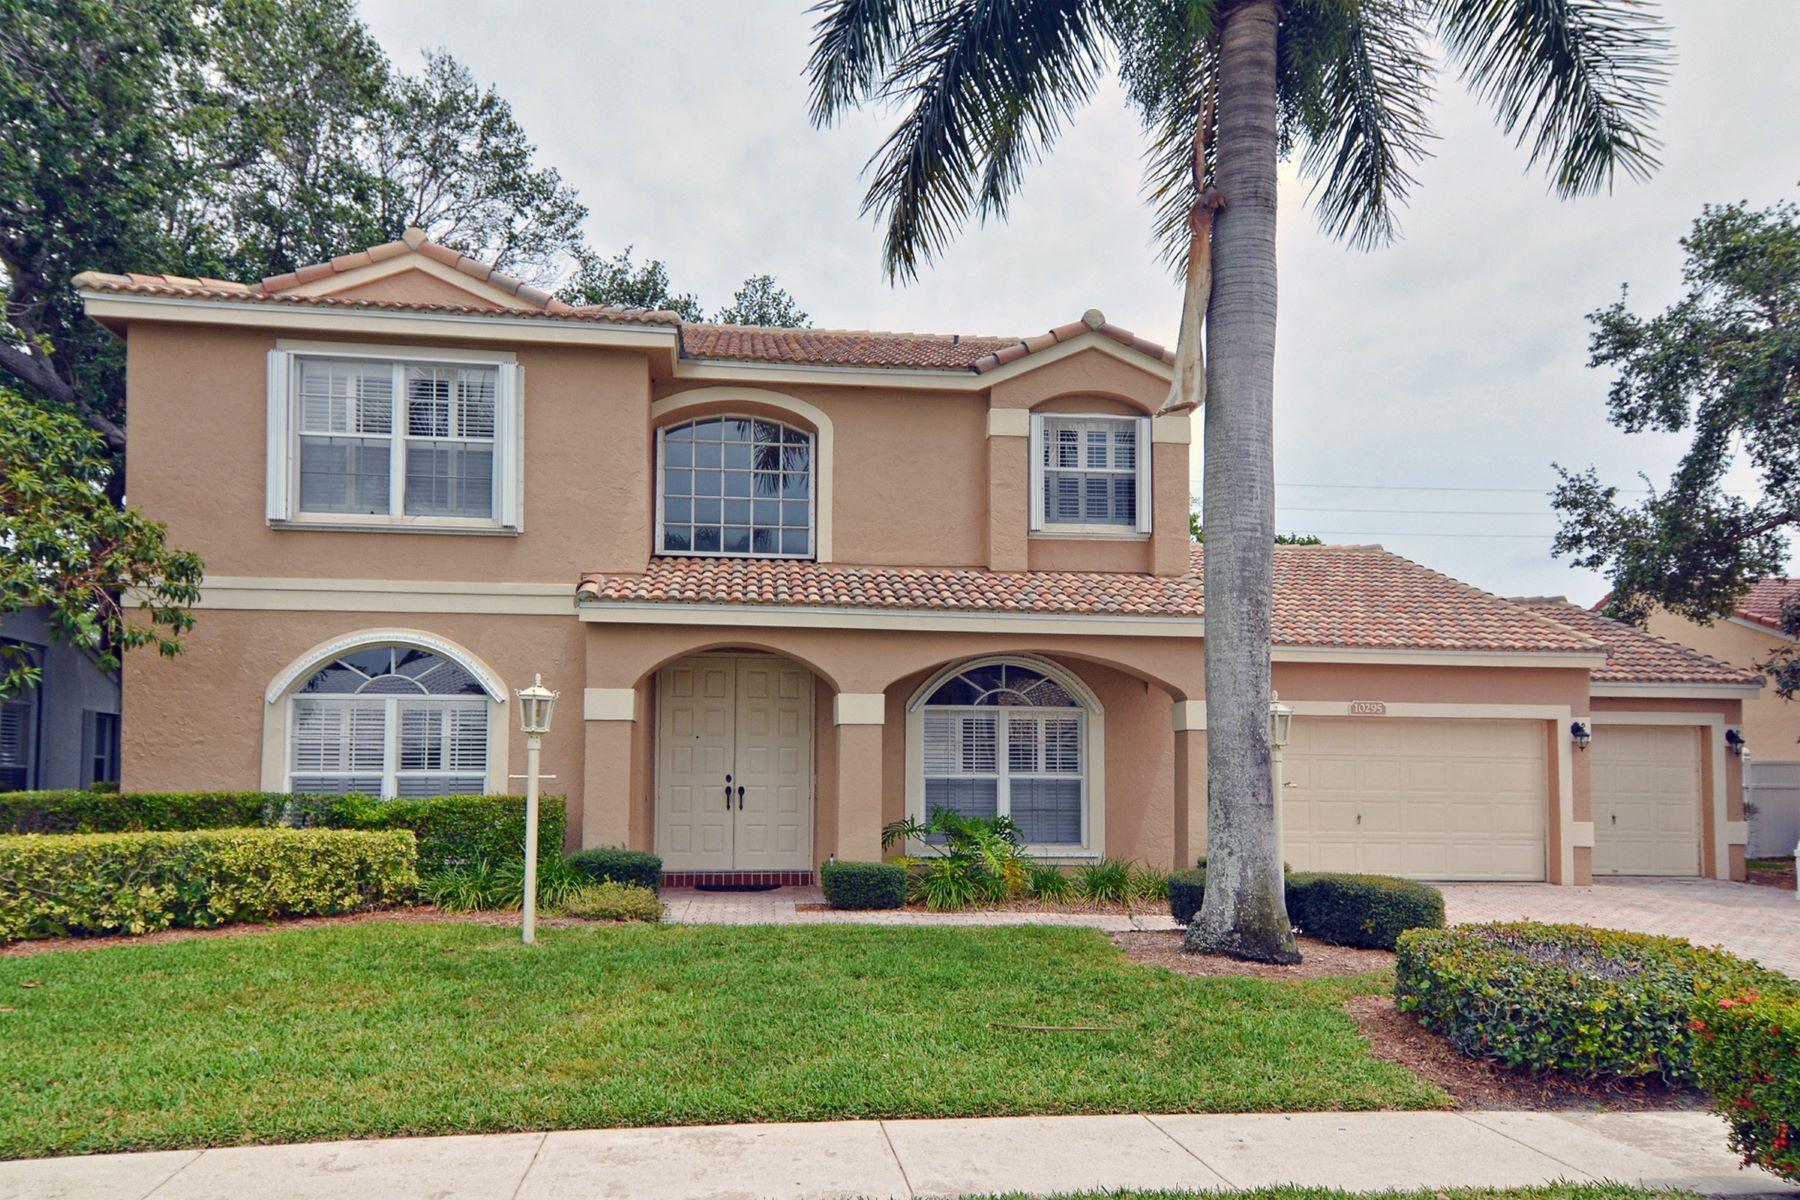 Villa per Vendita alle ore 10295 Allamanda Boulevard Siena Oaks, Palm Beach Gardens, Florida, 33410 Stati Uniti